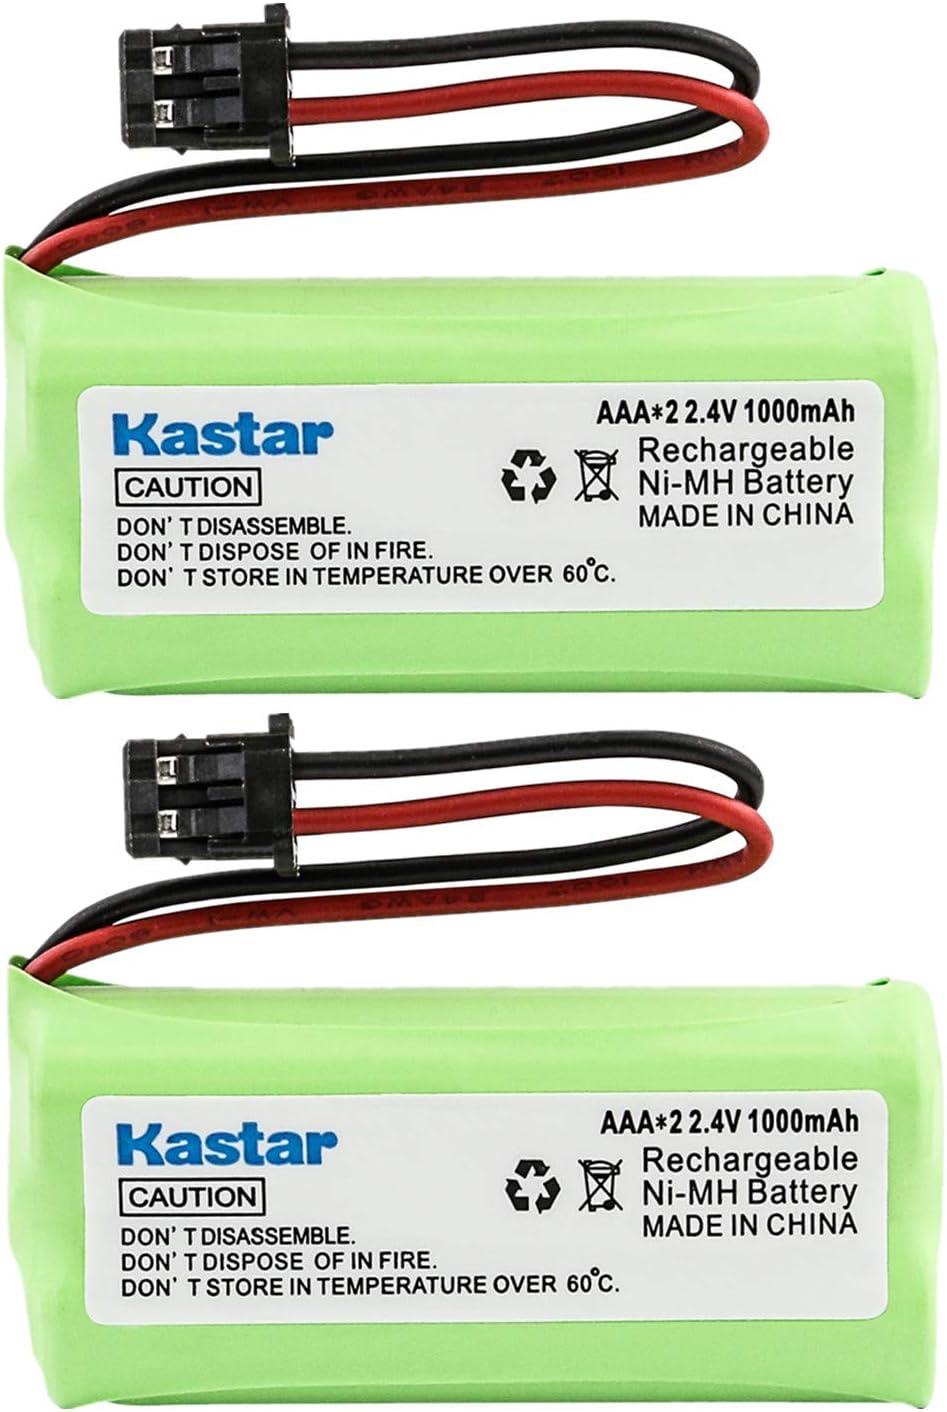 Kastar 2-Pack AAAX2 2.4V MSM 1000mAh Ni-MH Rechargeable Battery for Uniden BT-1008 BT-1016 BT1008S DECT20602 DECT 2080 DECT 2060-2 DWX-207 DECT20854WX DECT21802 Dantona BATT-1008 Empire CPH-515B